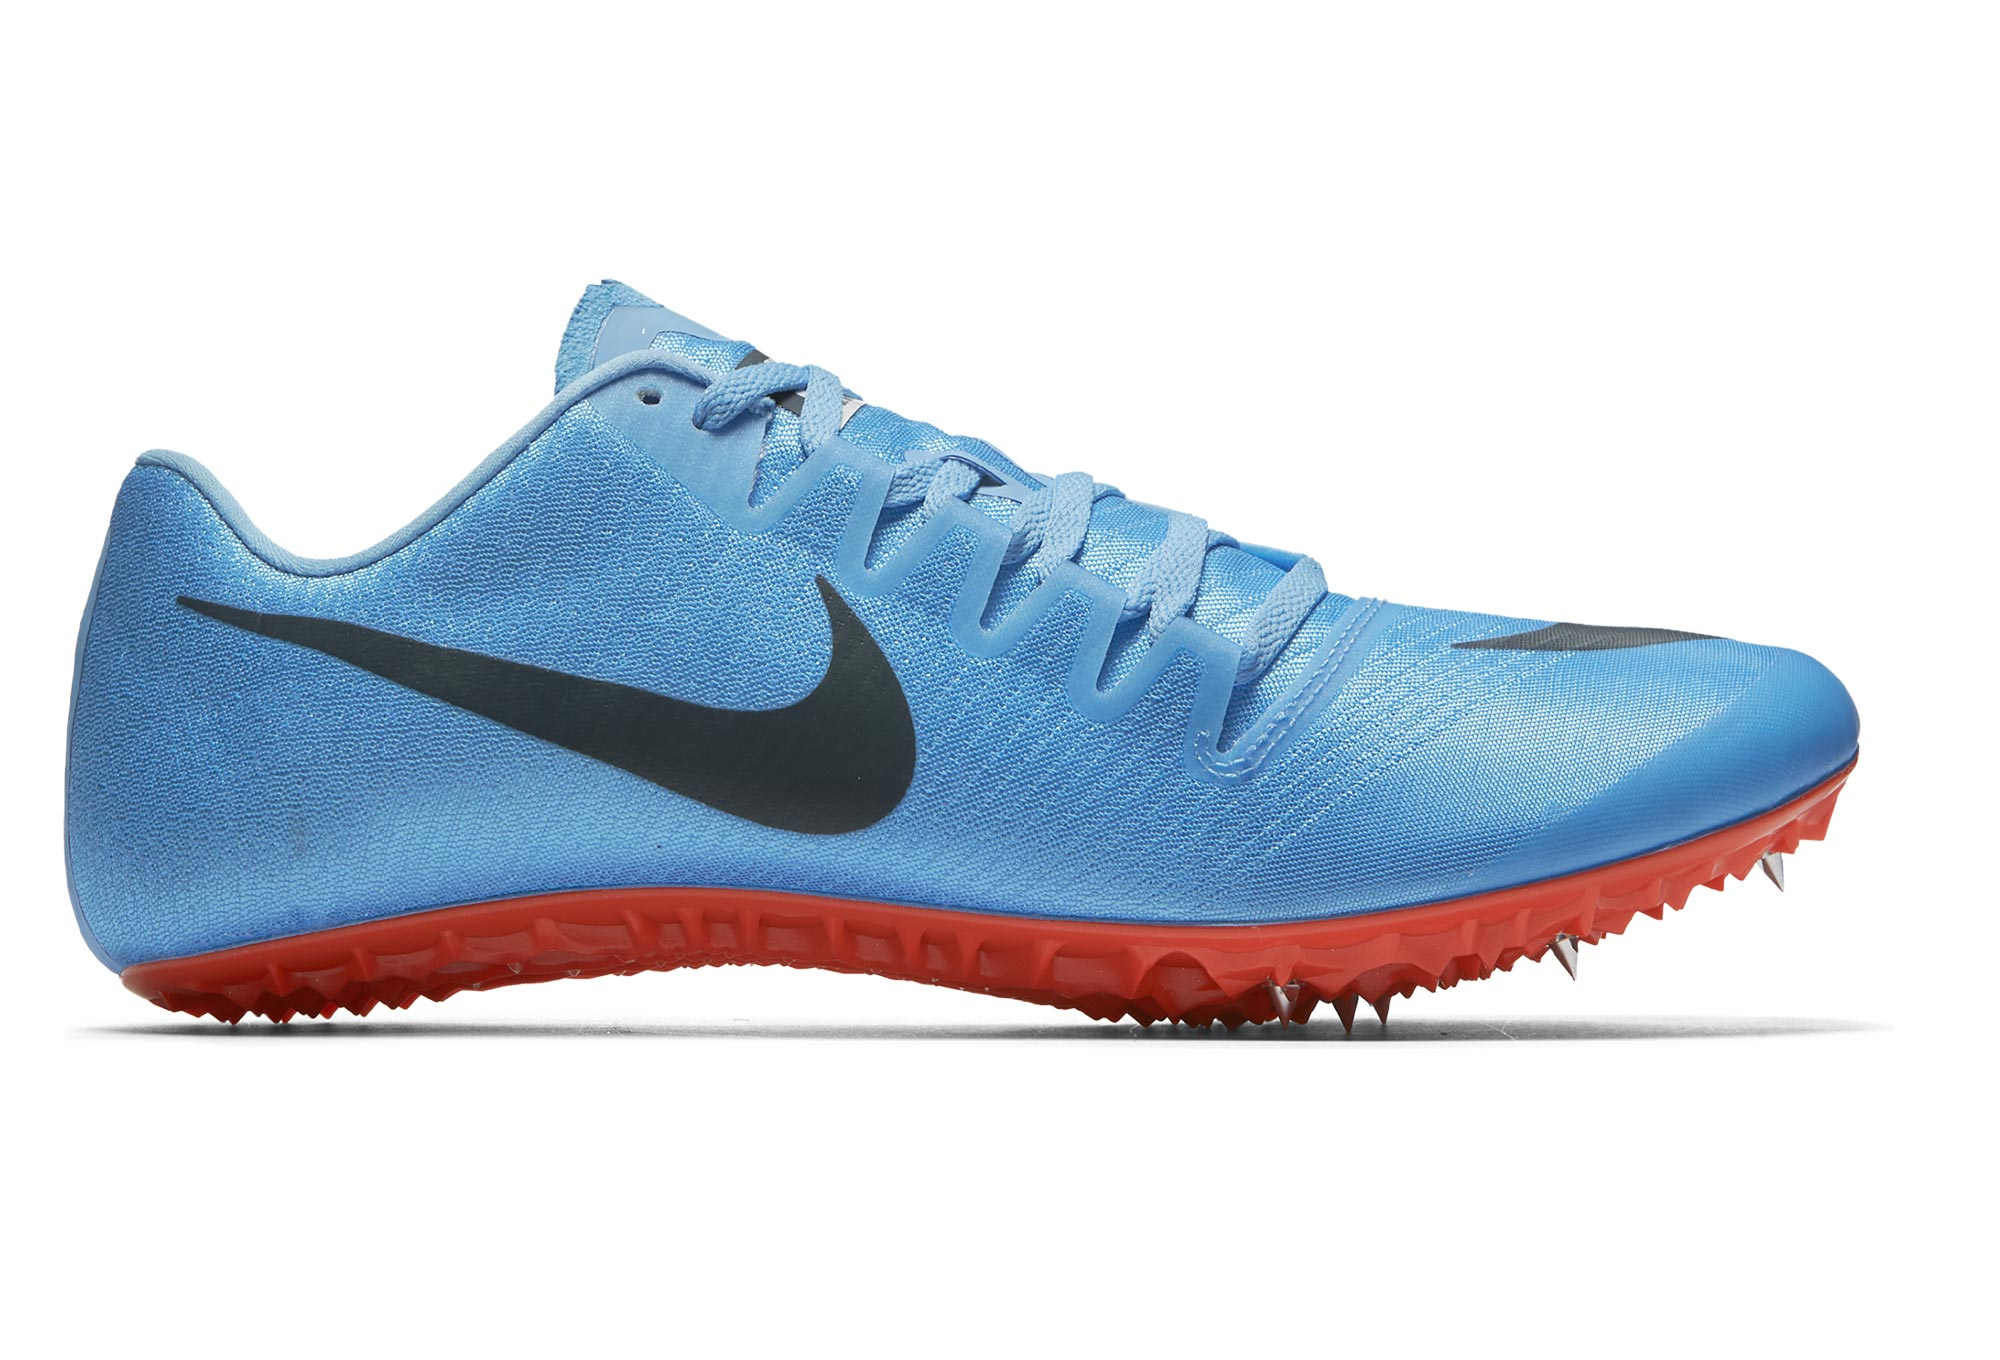 new style 0819d 4b375 Nike Zoom Ja Fly 3 Blue